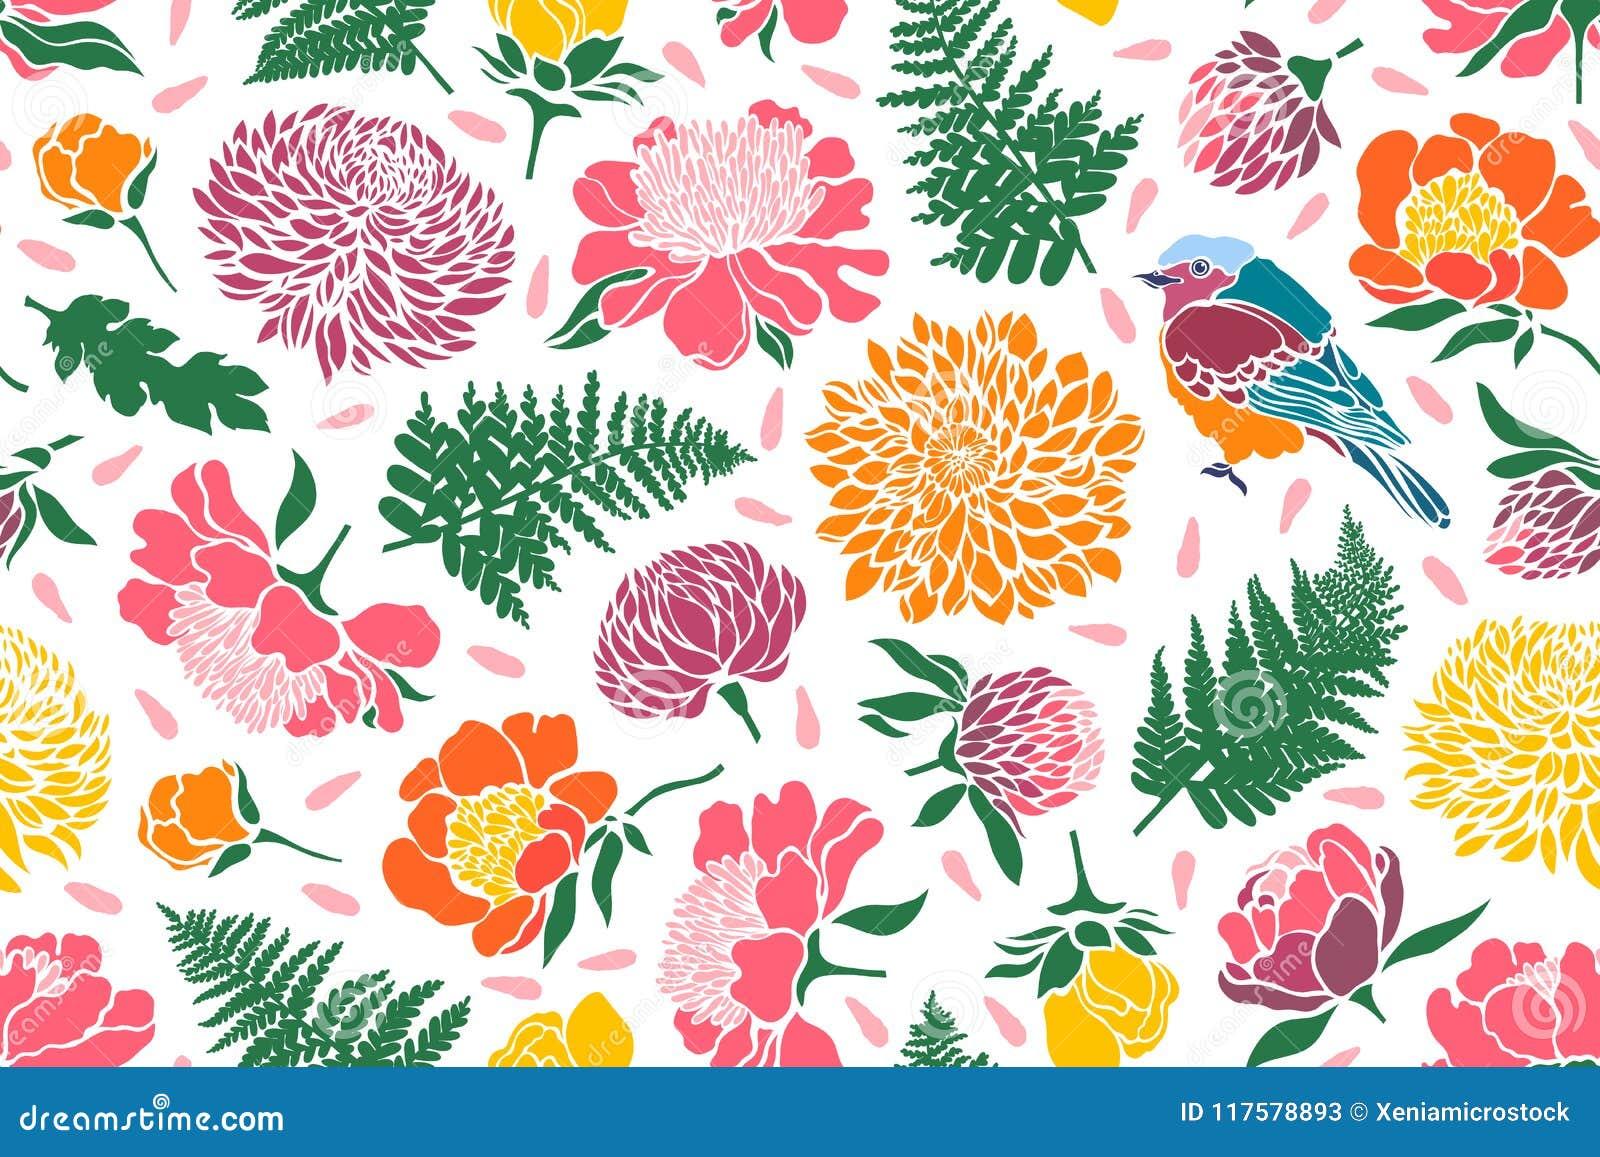 Nahtloses Muster mit Vögeln und Blumen Pfingstrose, Chrysantheme, Klee, Tulpe, Farn